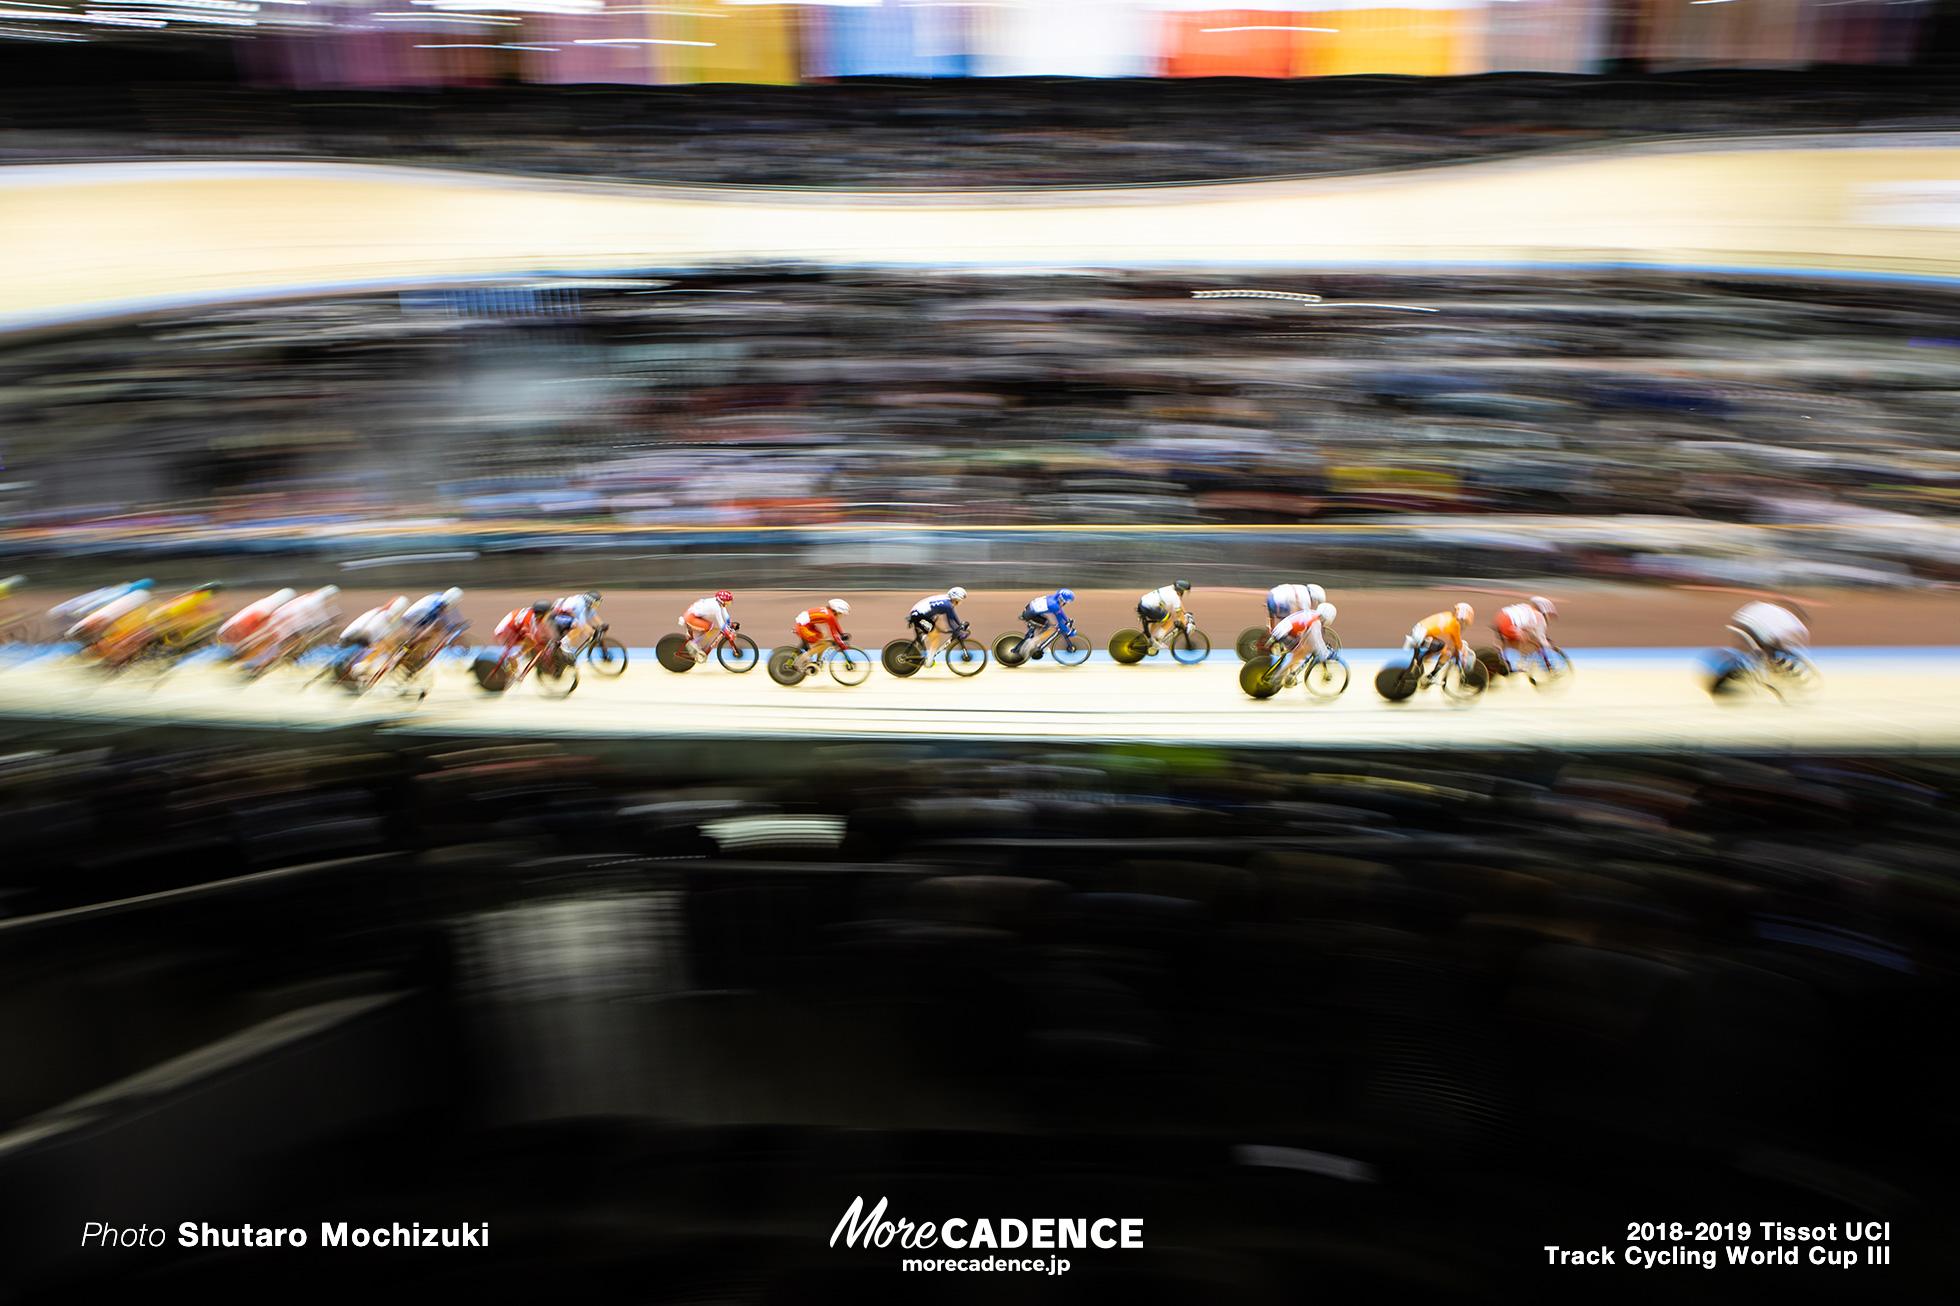 Women's Omnium - Point Race/2018-2019 Track Cycling World Cup III Berlin